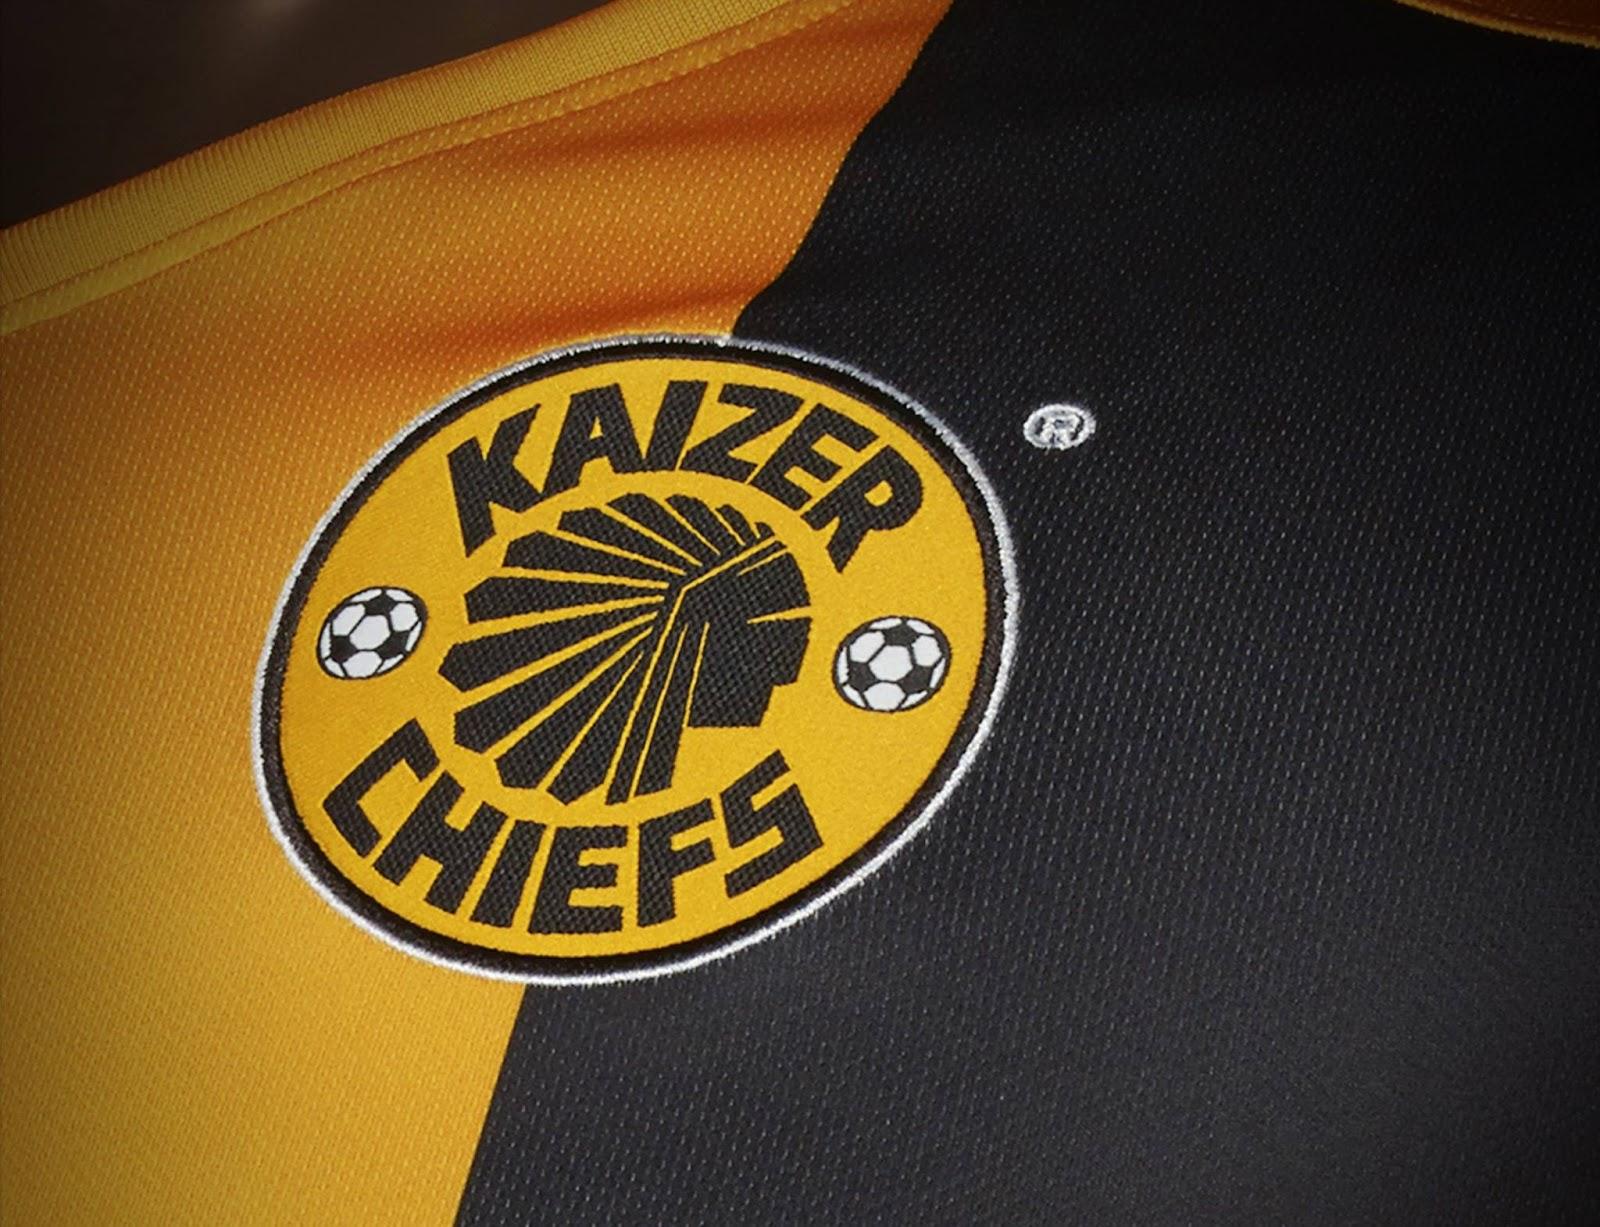 Kaizer Chiefs: Nike Kaizer Chiefs 14-15 Kits Unveiled